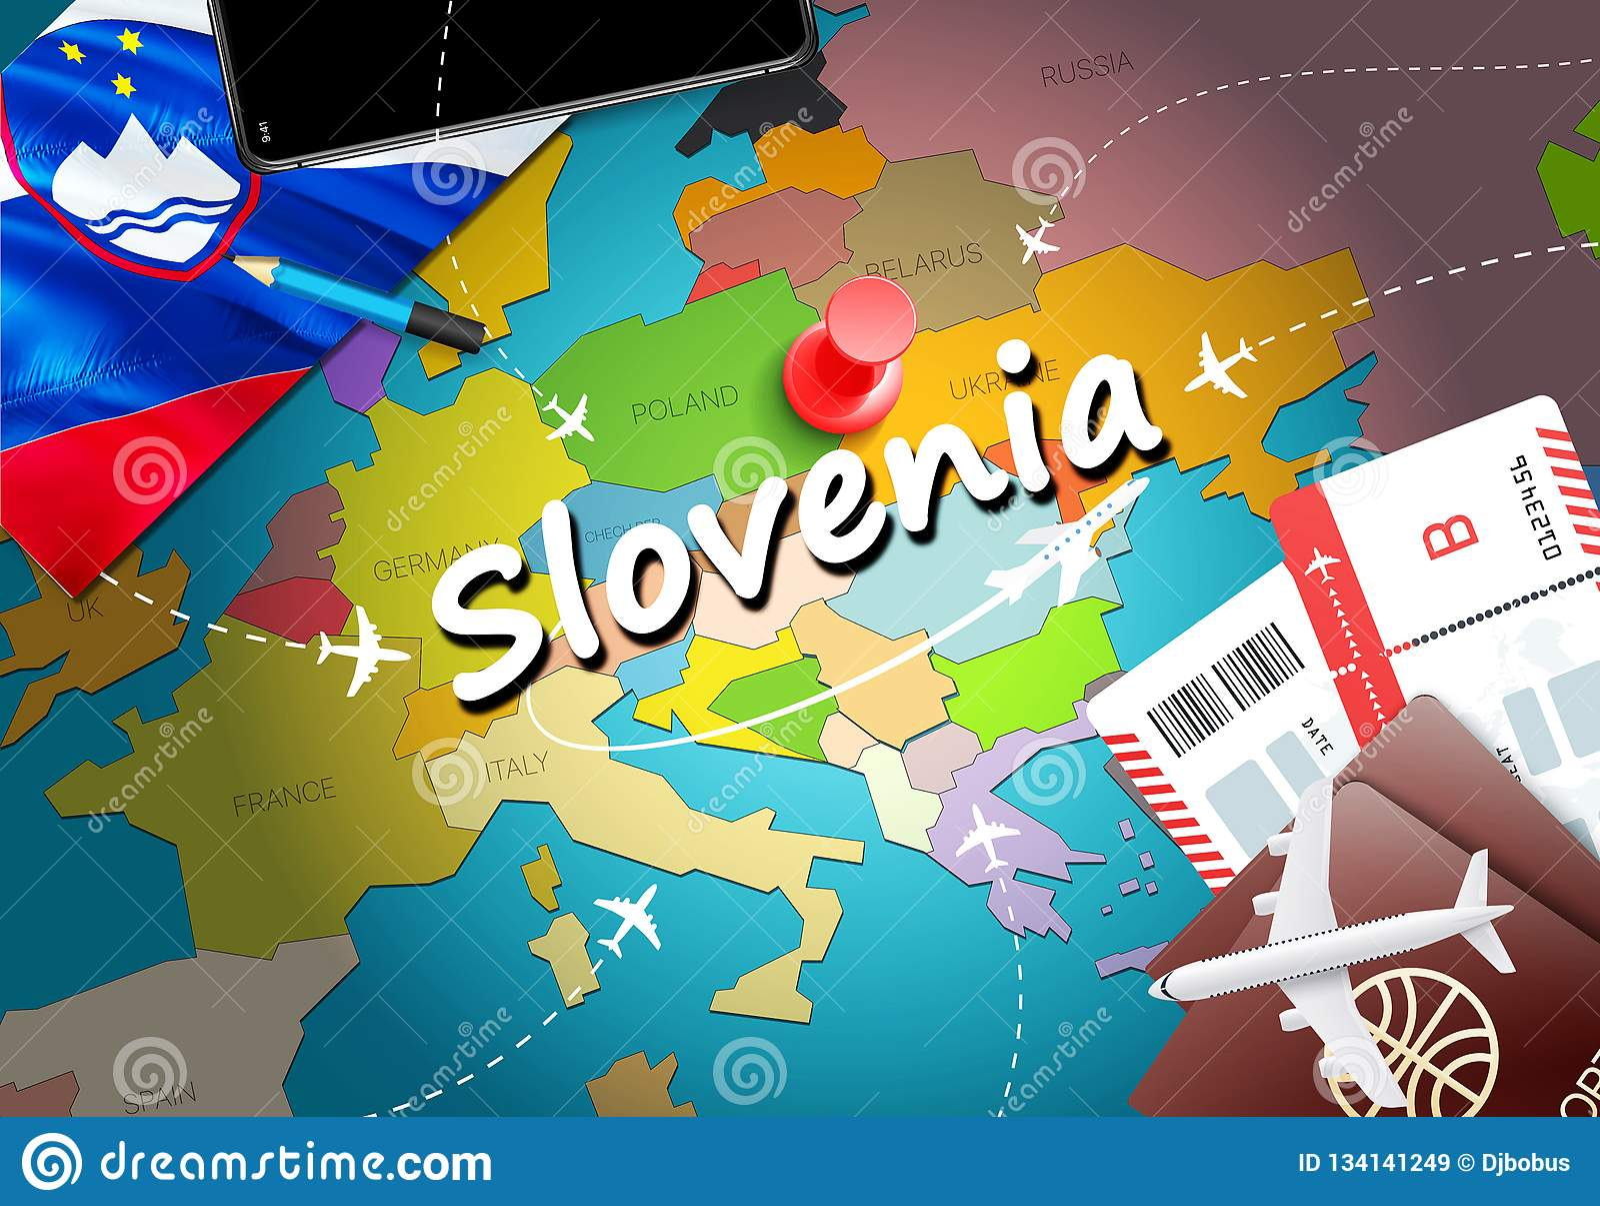 Slovenia travel concept map background with planes,tickets. Visit Slovenia travel and tourism destination concept. Slovenia flag